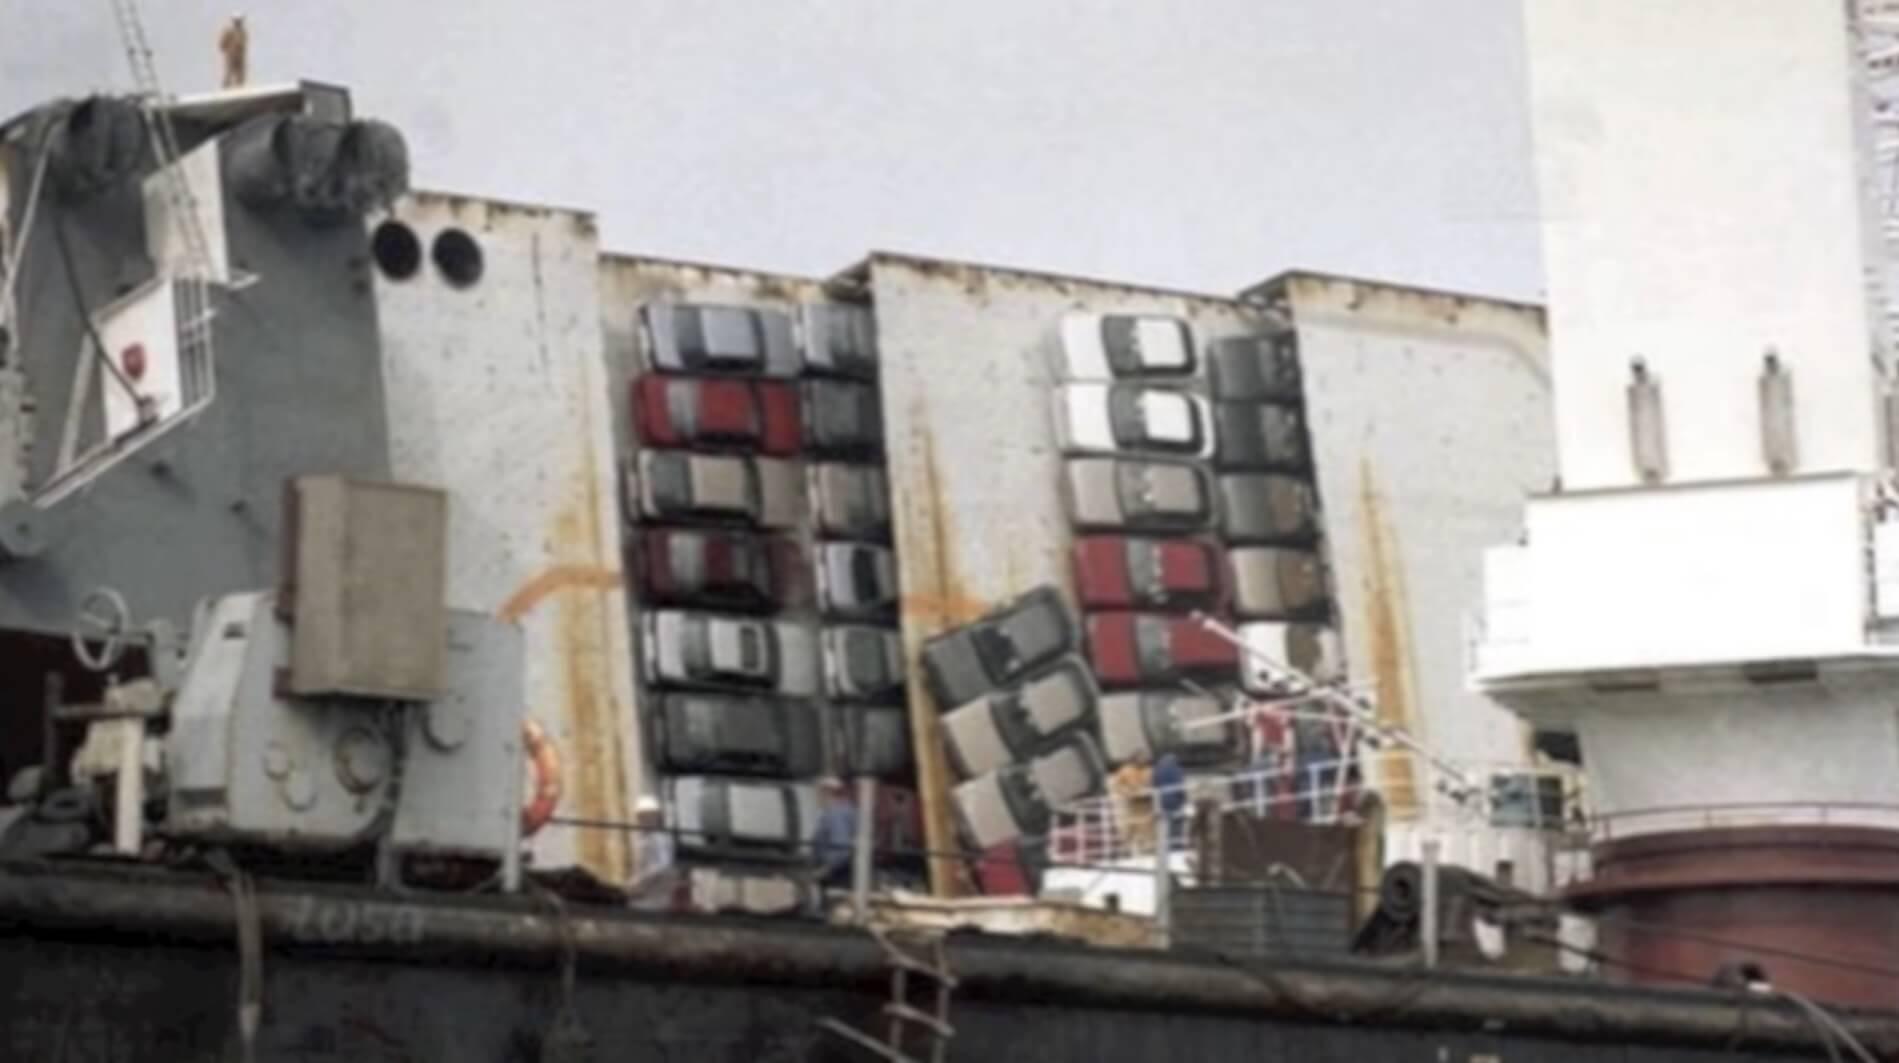 MV Reijin naufragio